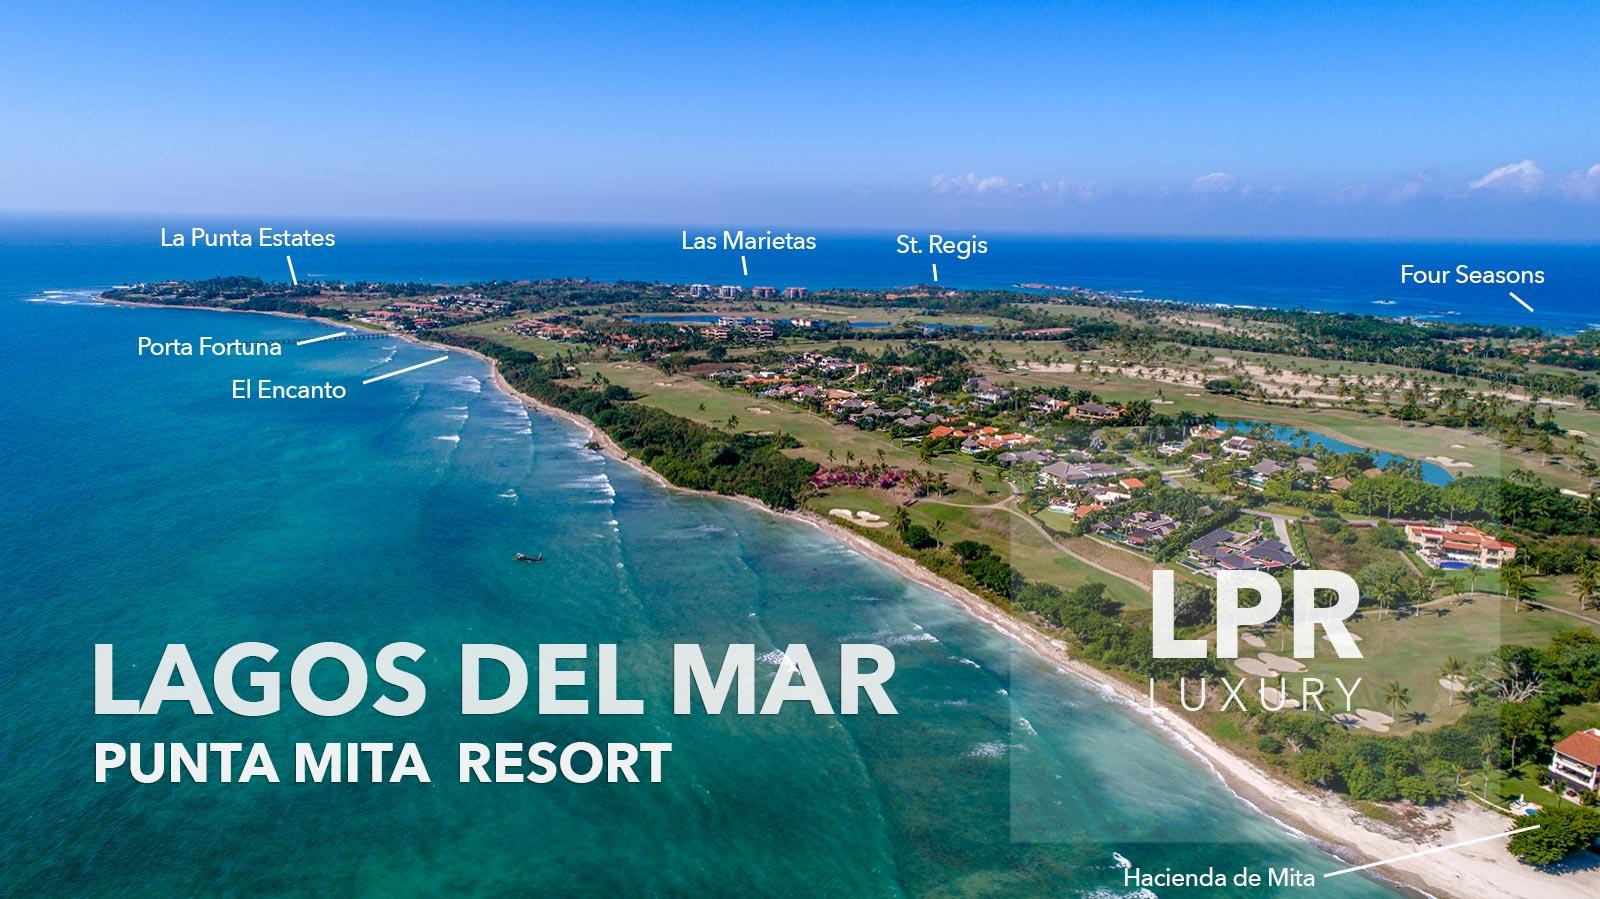 Explore the luxury golf villas of Lagos del Mar 20 at the ultra private Punta Mita Resort - Riviera Nayarit, Mexico